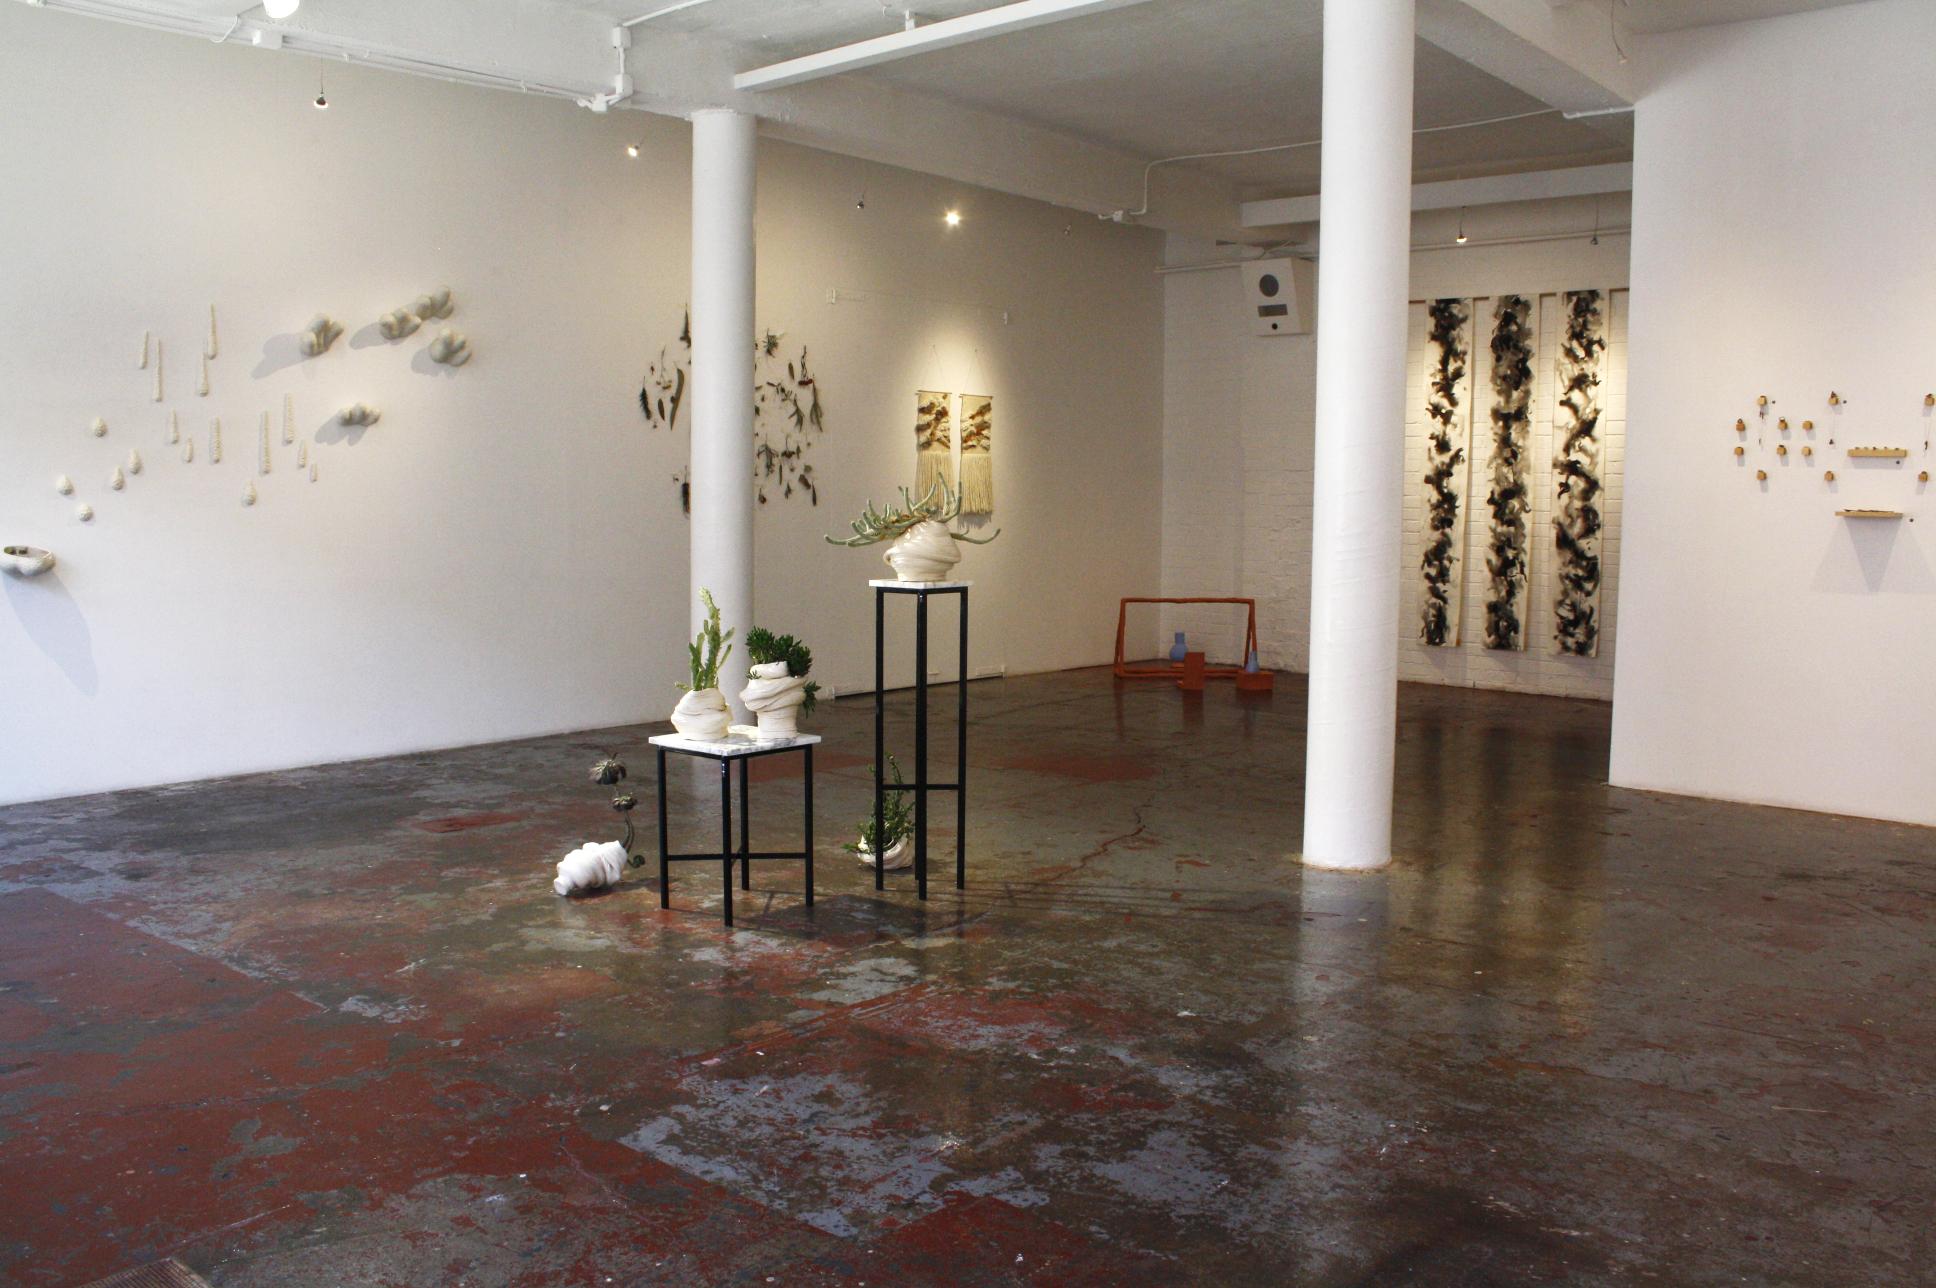 Installation view,  Wonky,  2016, Tinning Street Presents. Photo: Caitlin Shearer